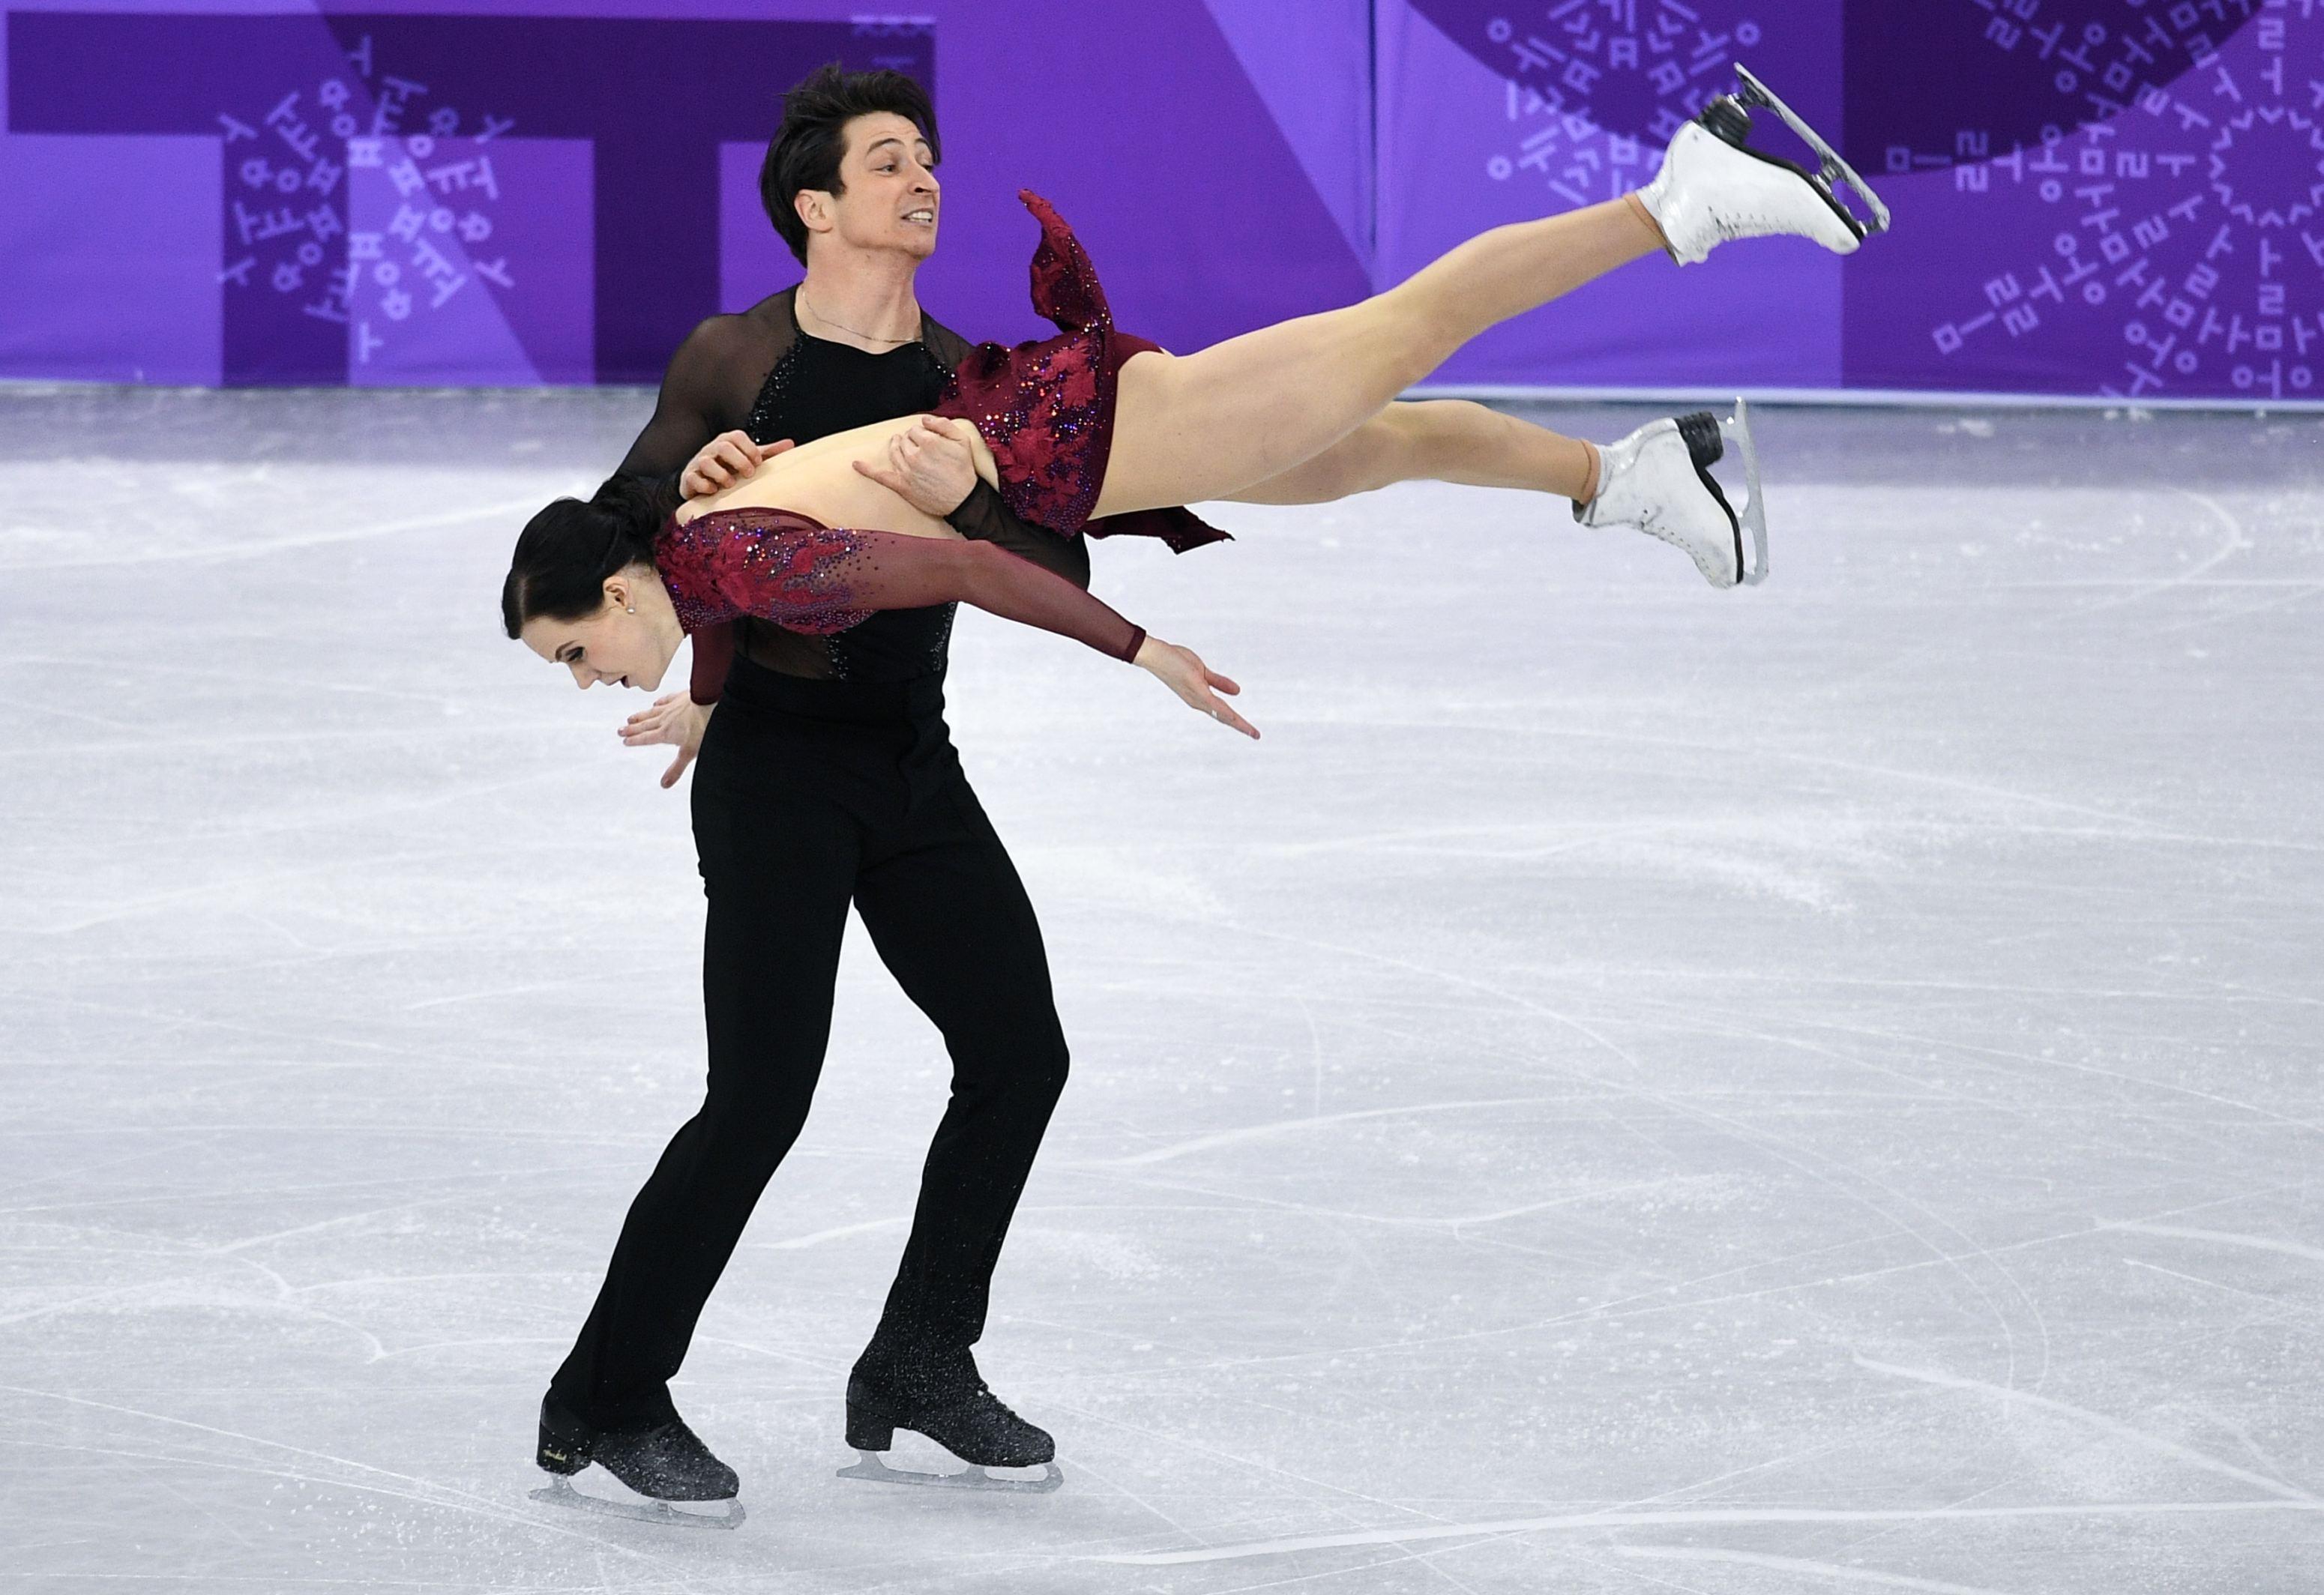 patinatorii pereche olimpică dating gemeni femeie datând balanul balan